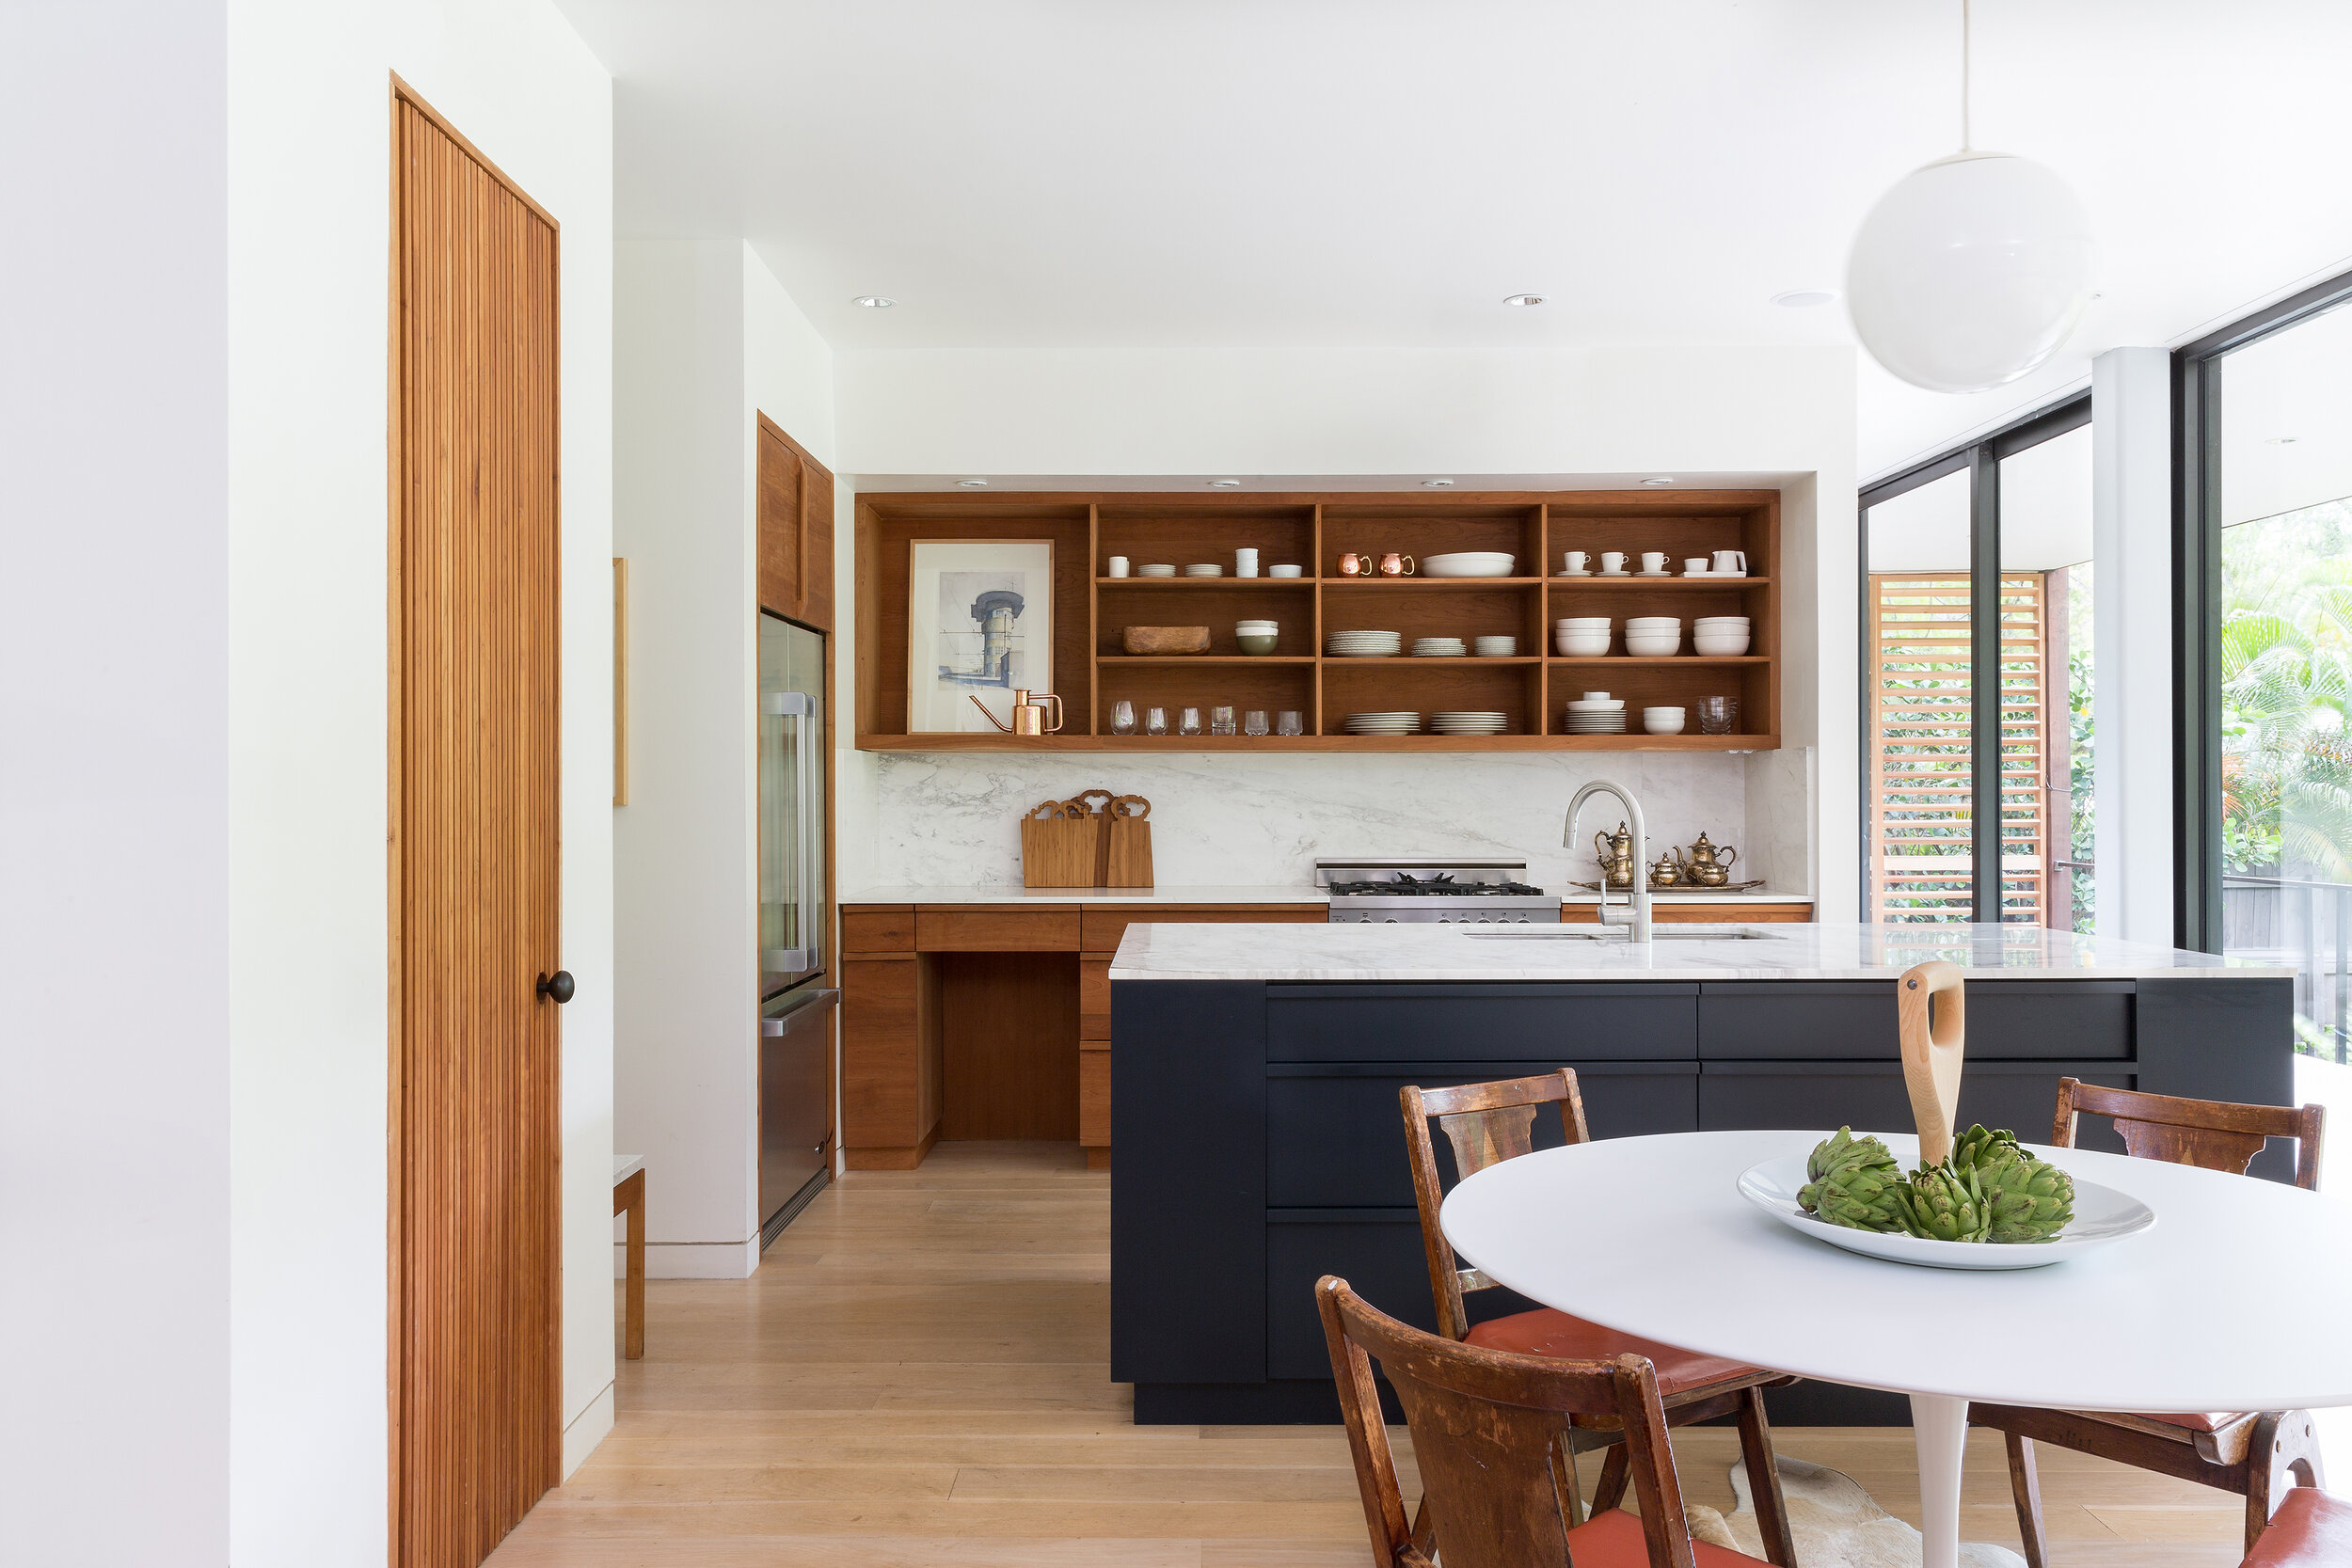 1_Kitchen_Credit Claudia Uribe.jpg